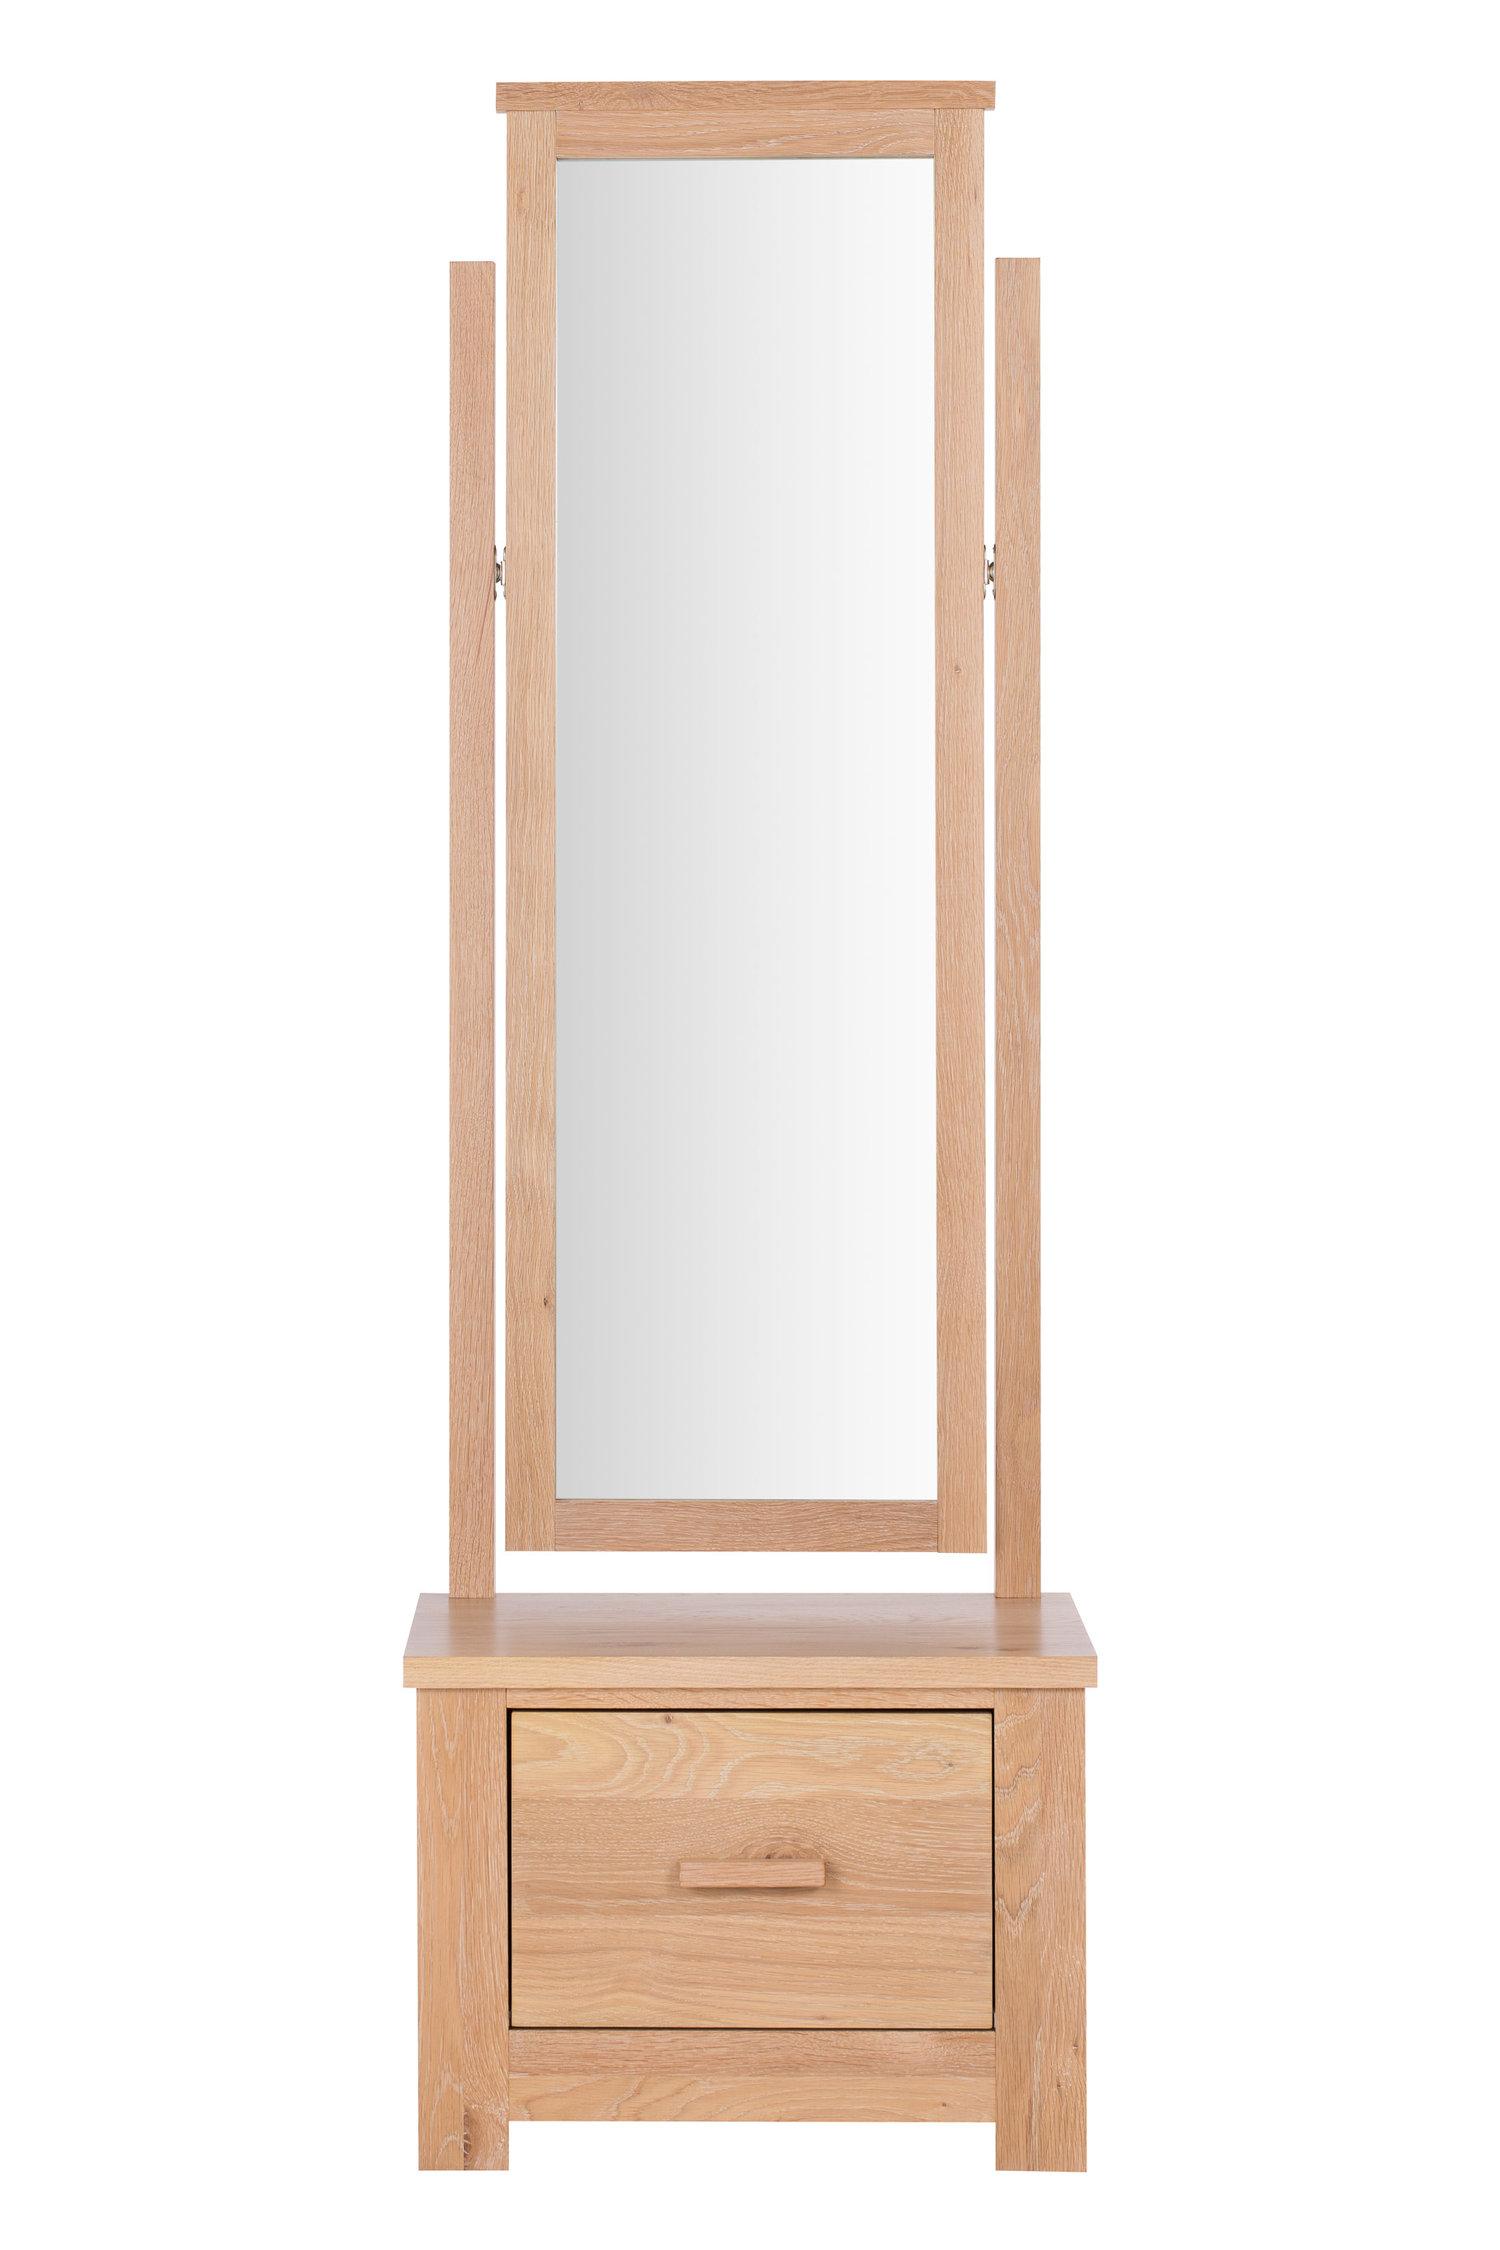 Simple_Furniture_product_TBP_5.jpg